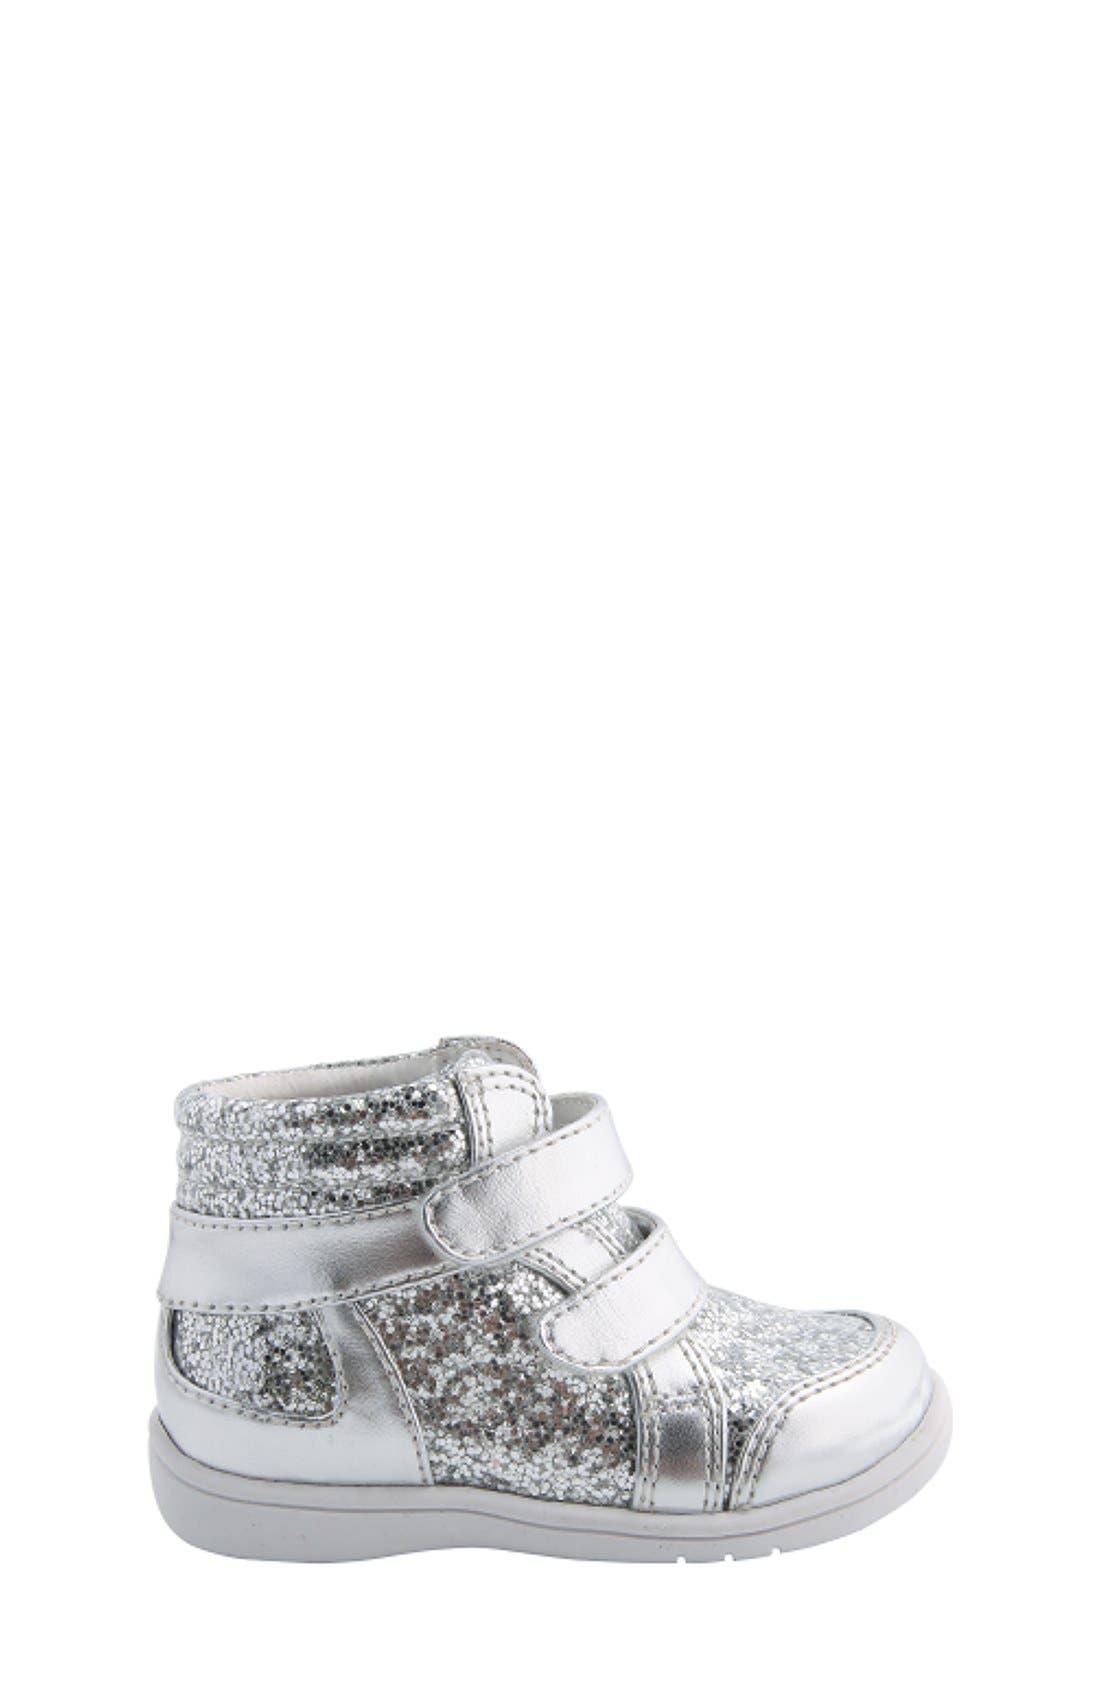 Nina 'Stardust' Metallic High Top Sneaker,                             Alternate thumbnail 6, color,                             047